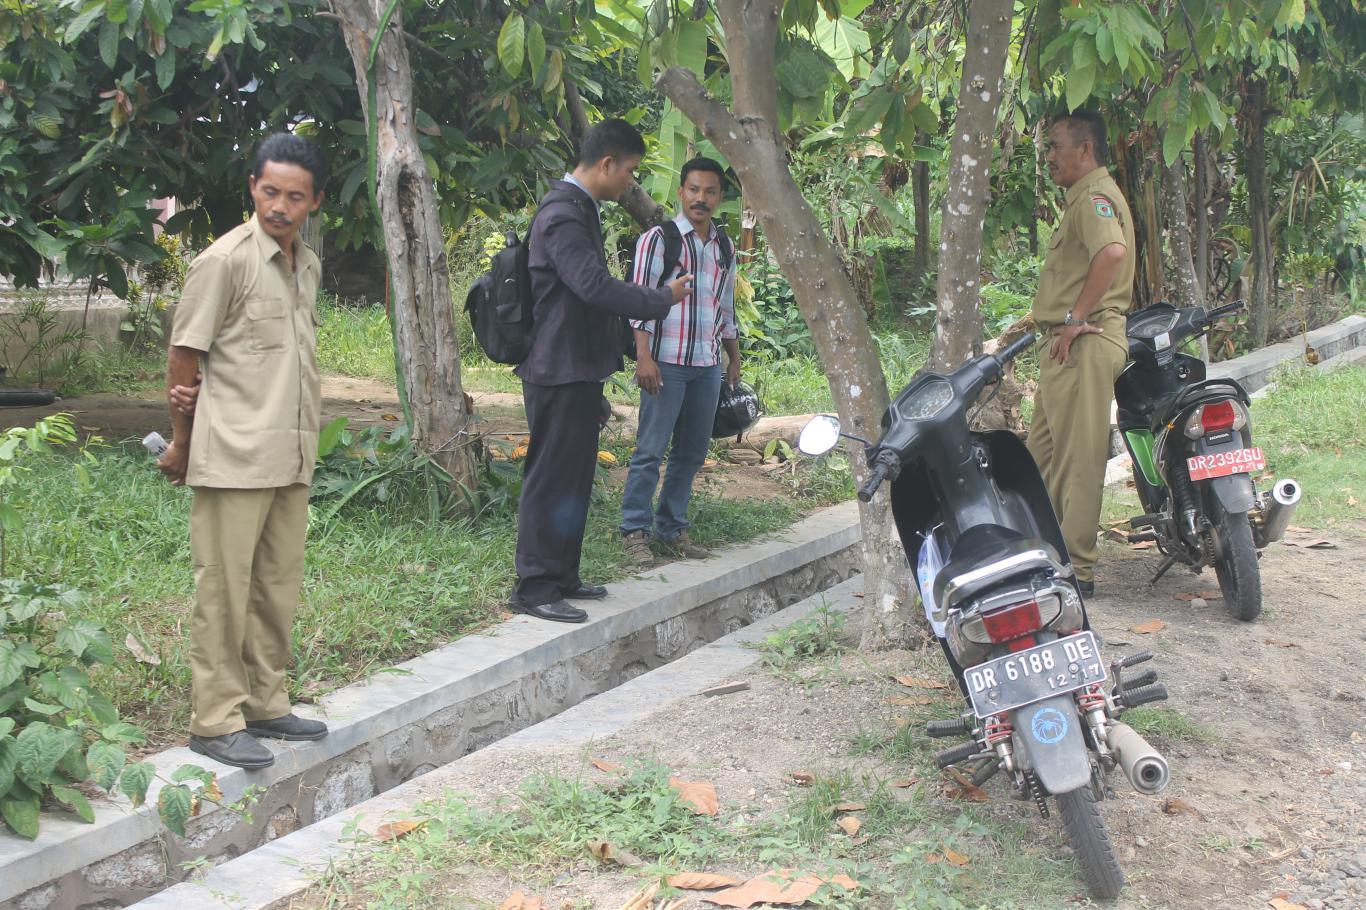 Lembaga Kemasyarakatan Website Gumantar Tiyu Ngumbak Kegitan Pembangunan Wisata Adat